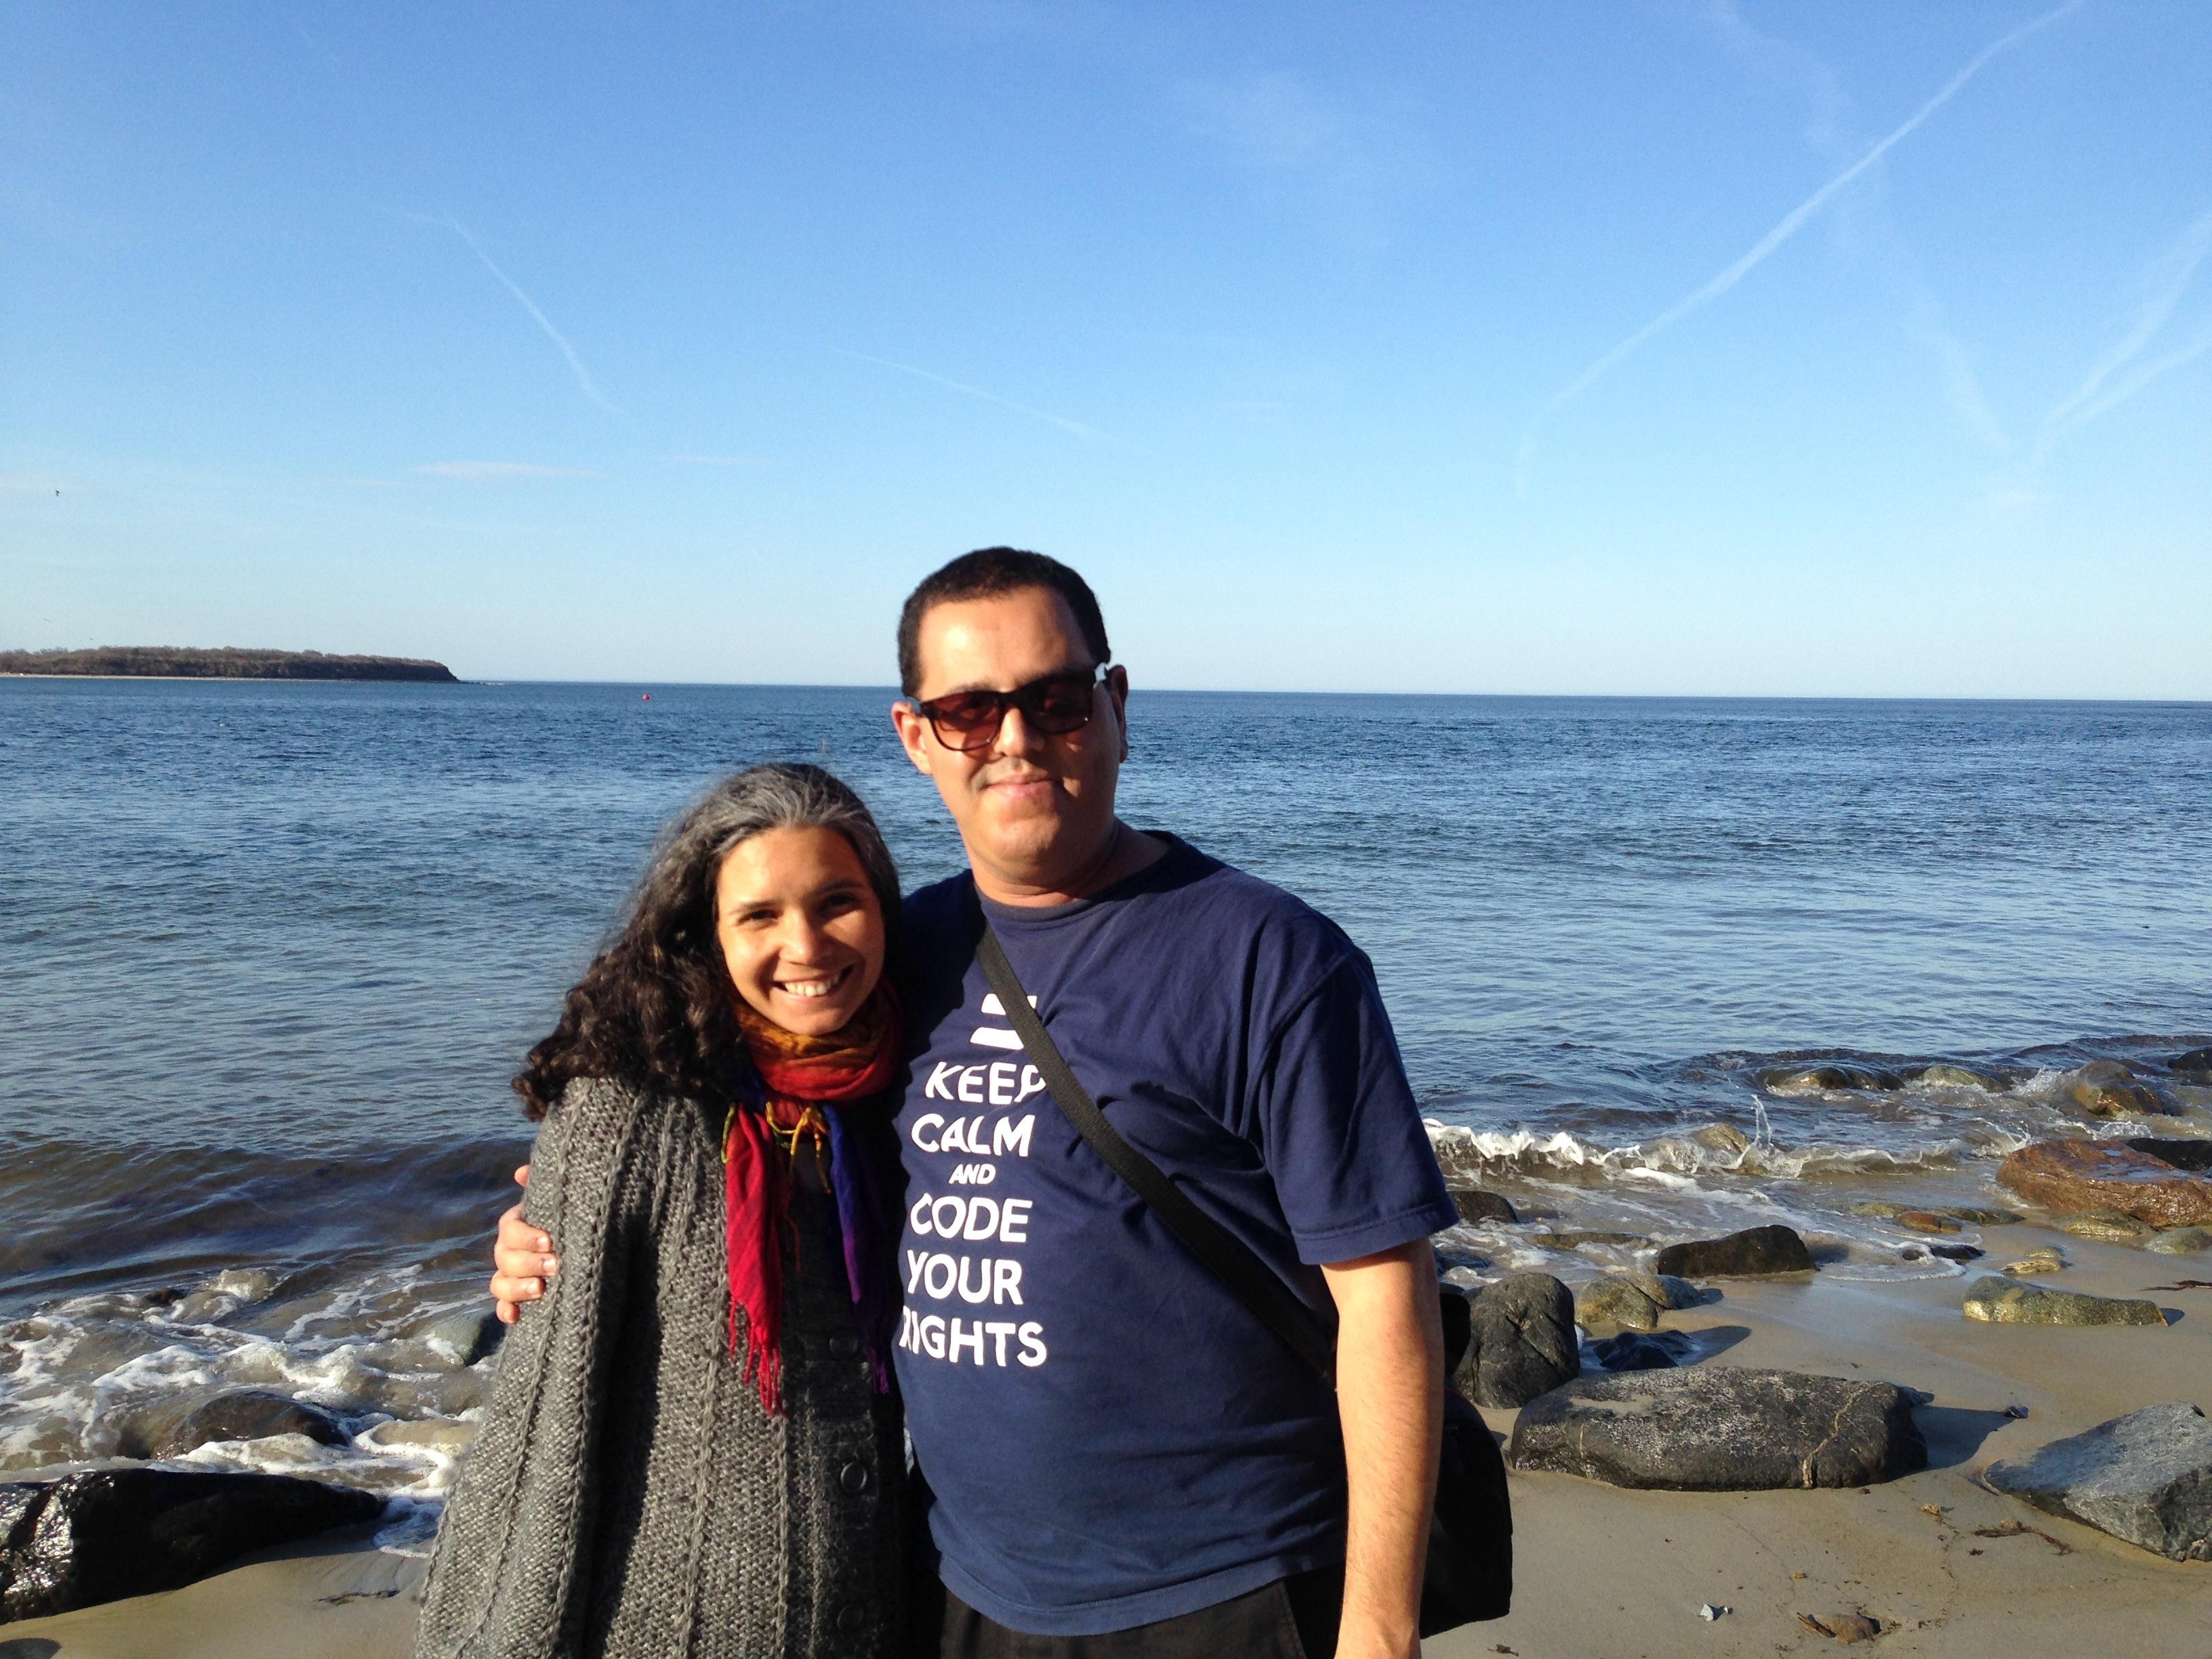 Hisham and Paula Goes. PHOTO: Ellery Biddle